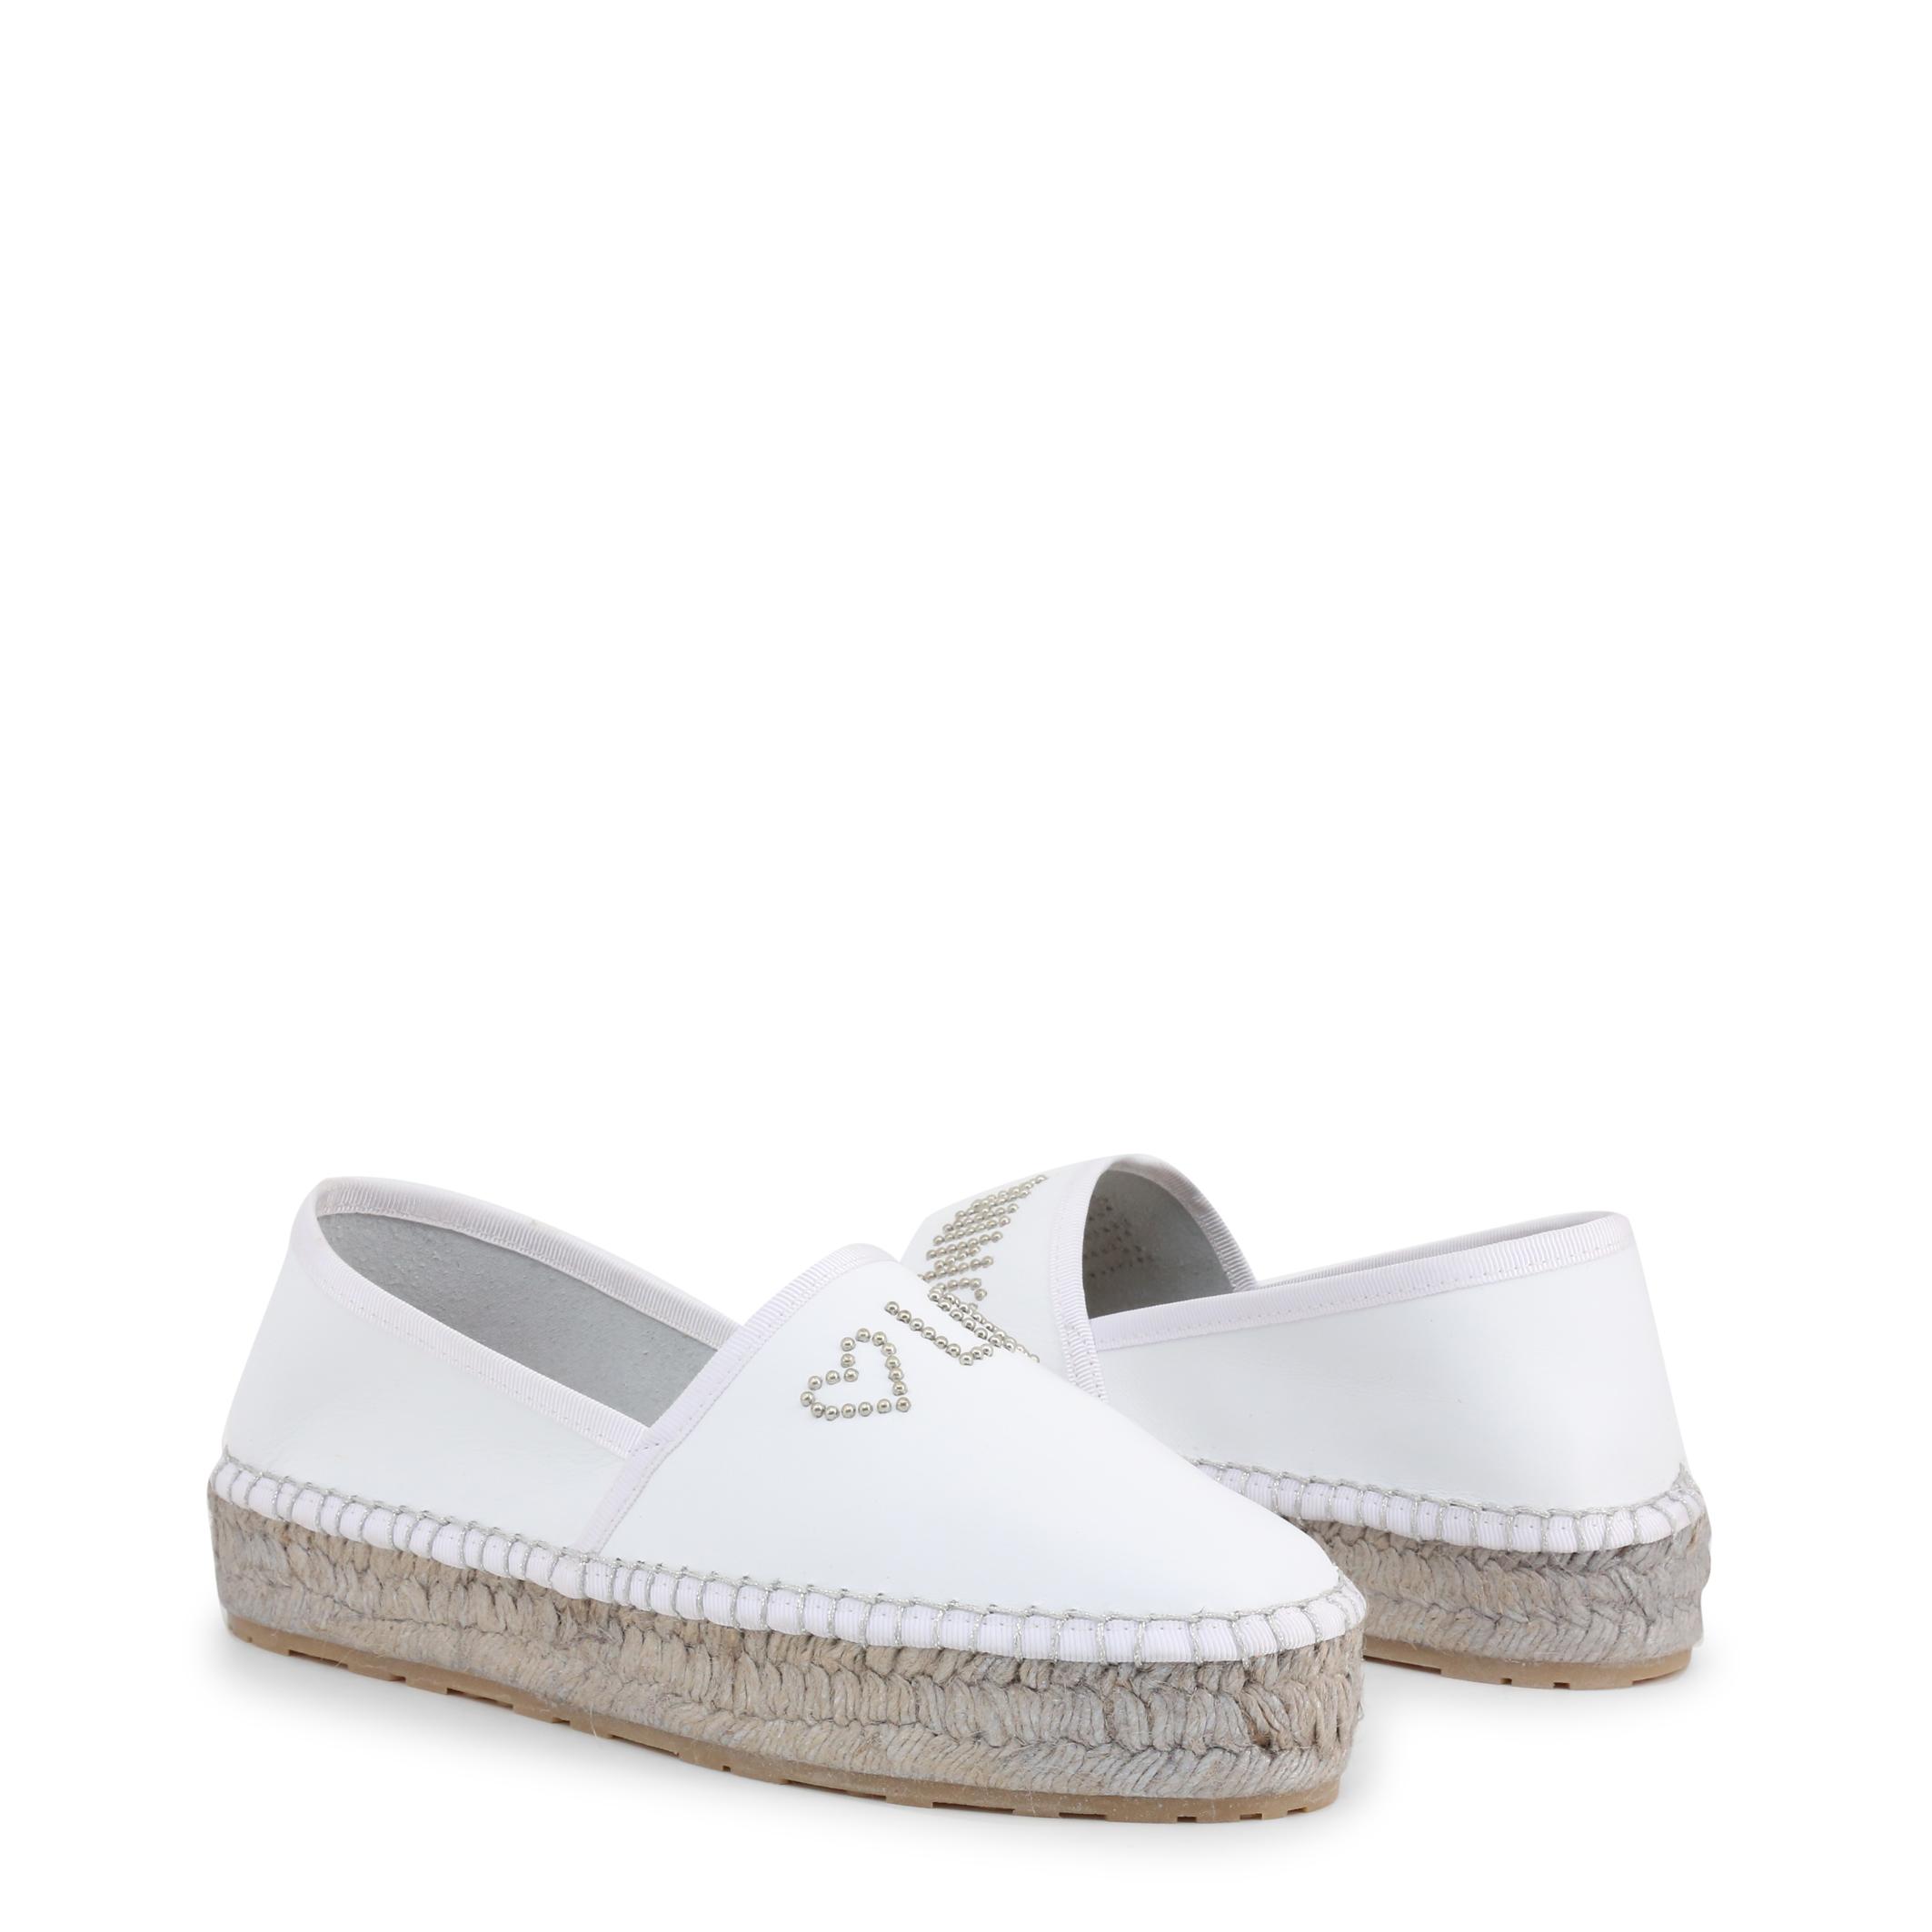 Chaussures de ville  Love moschino JA10393G0AJA_0100 white